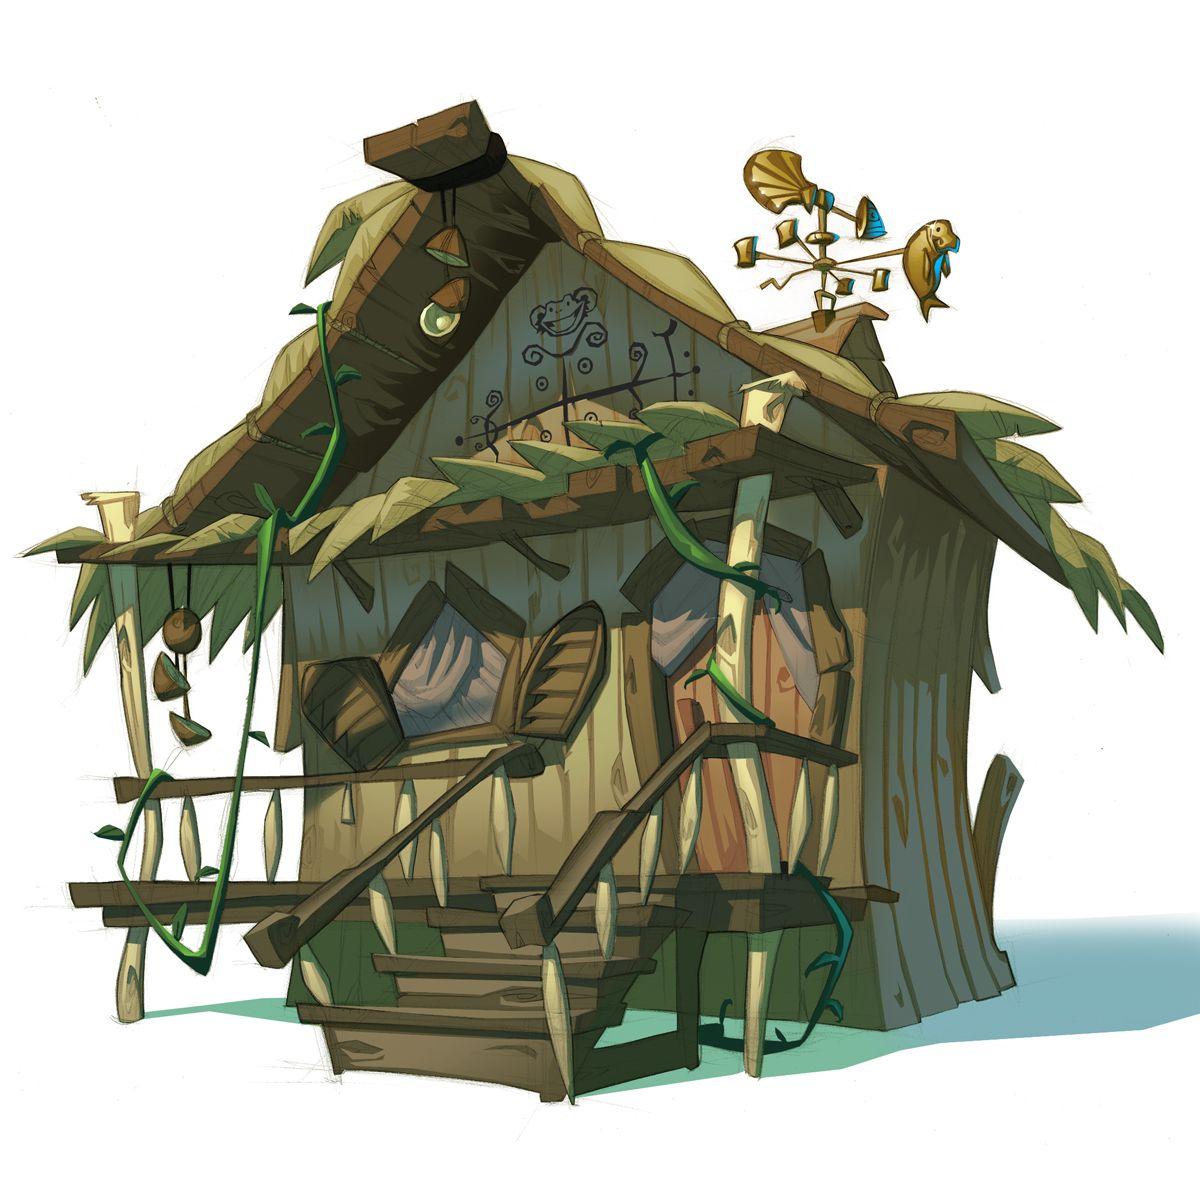 Monkey island 2 lechuck s revenge concept art the international - Tales Of Monkey Island 2009